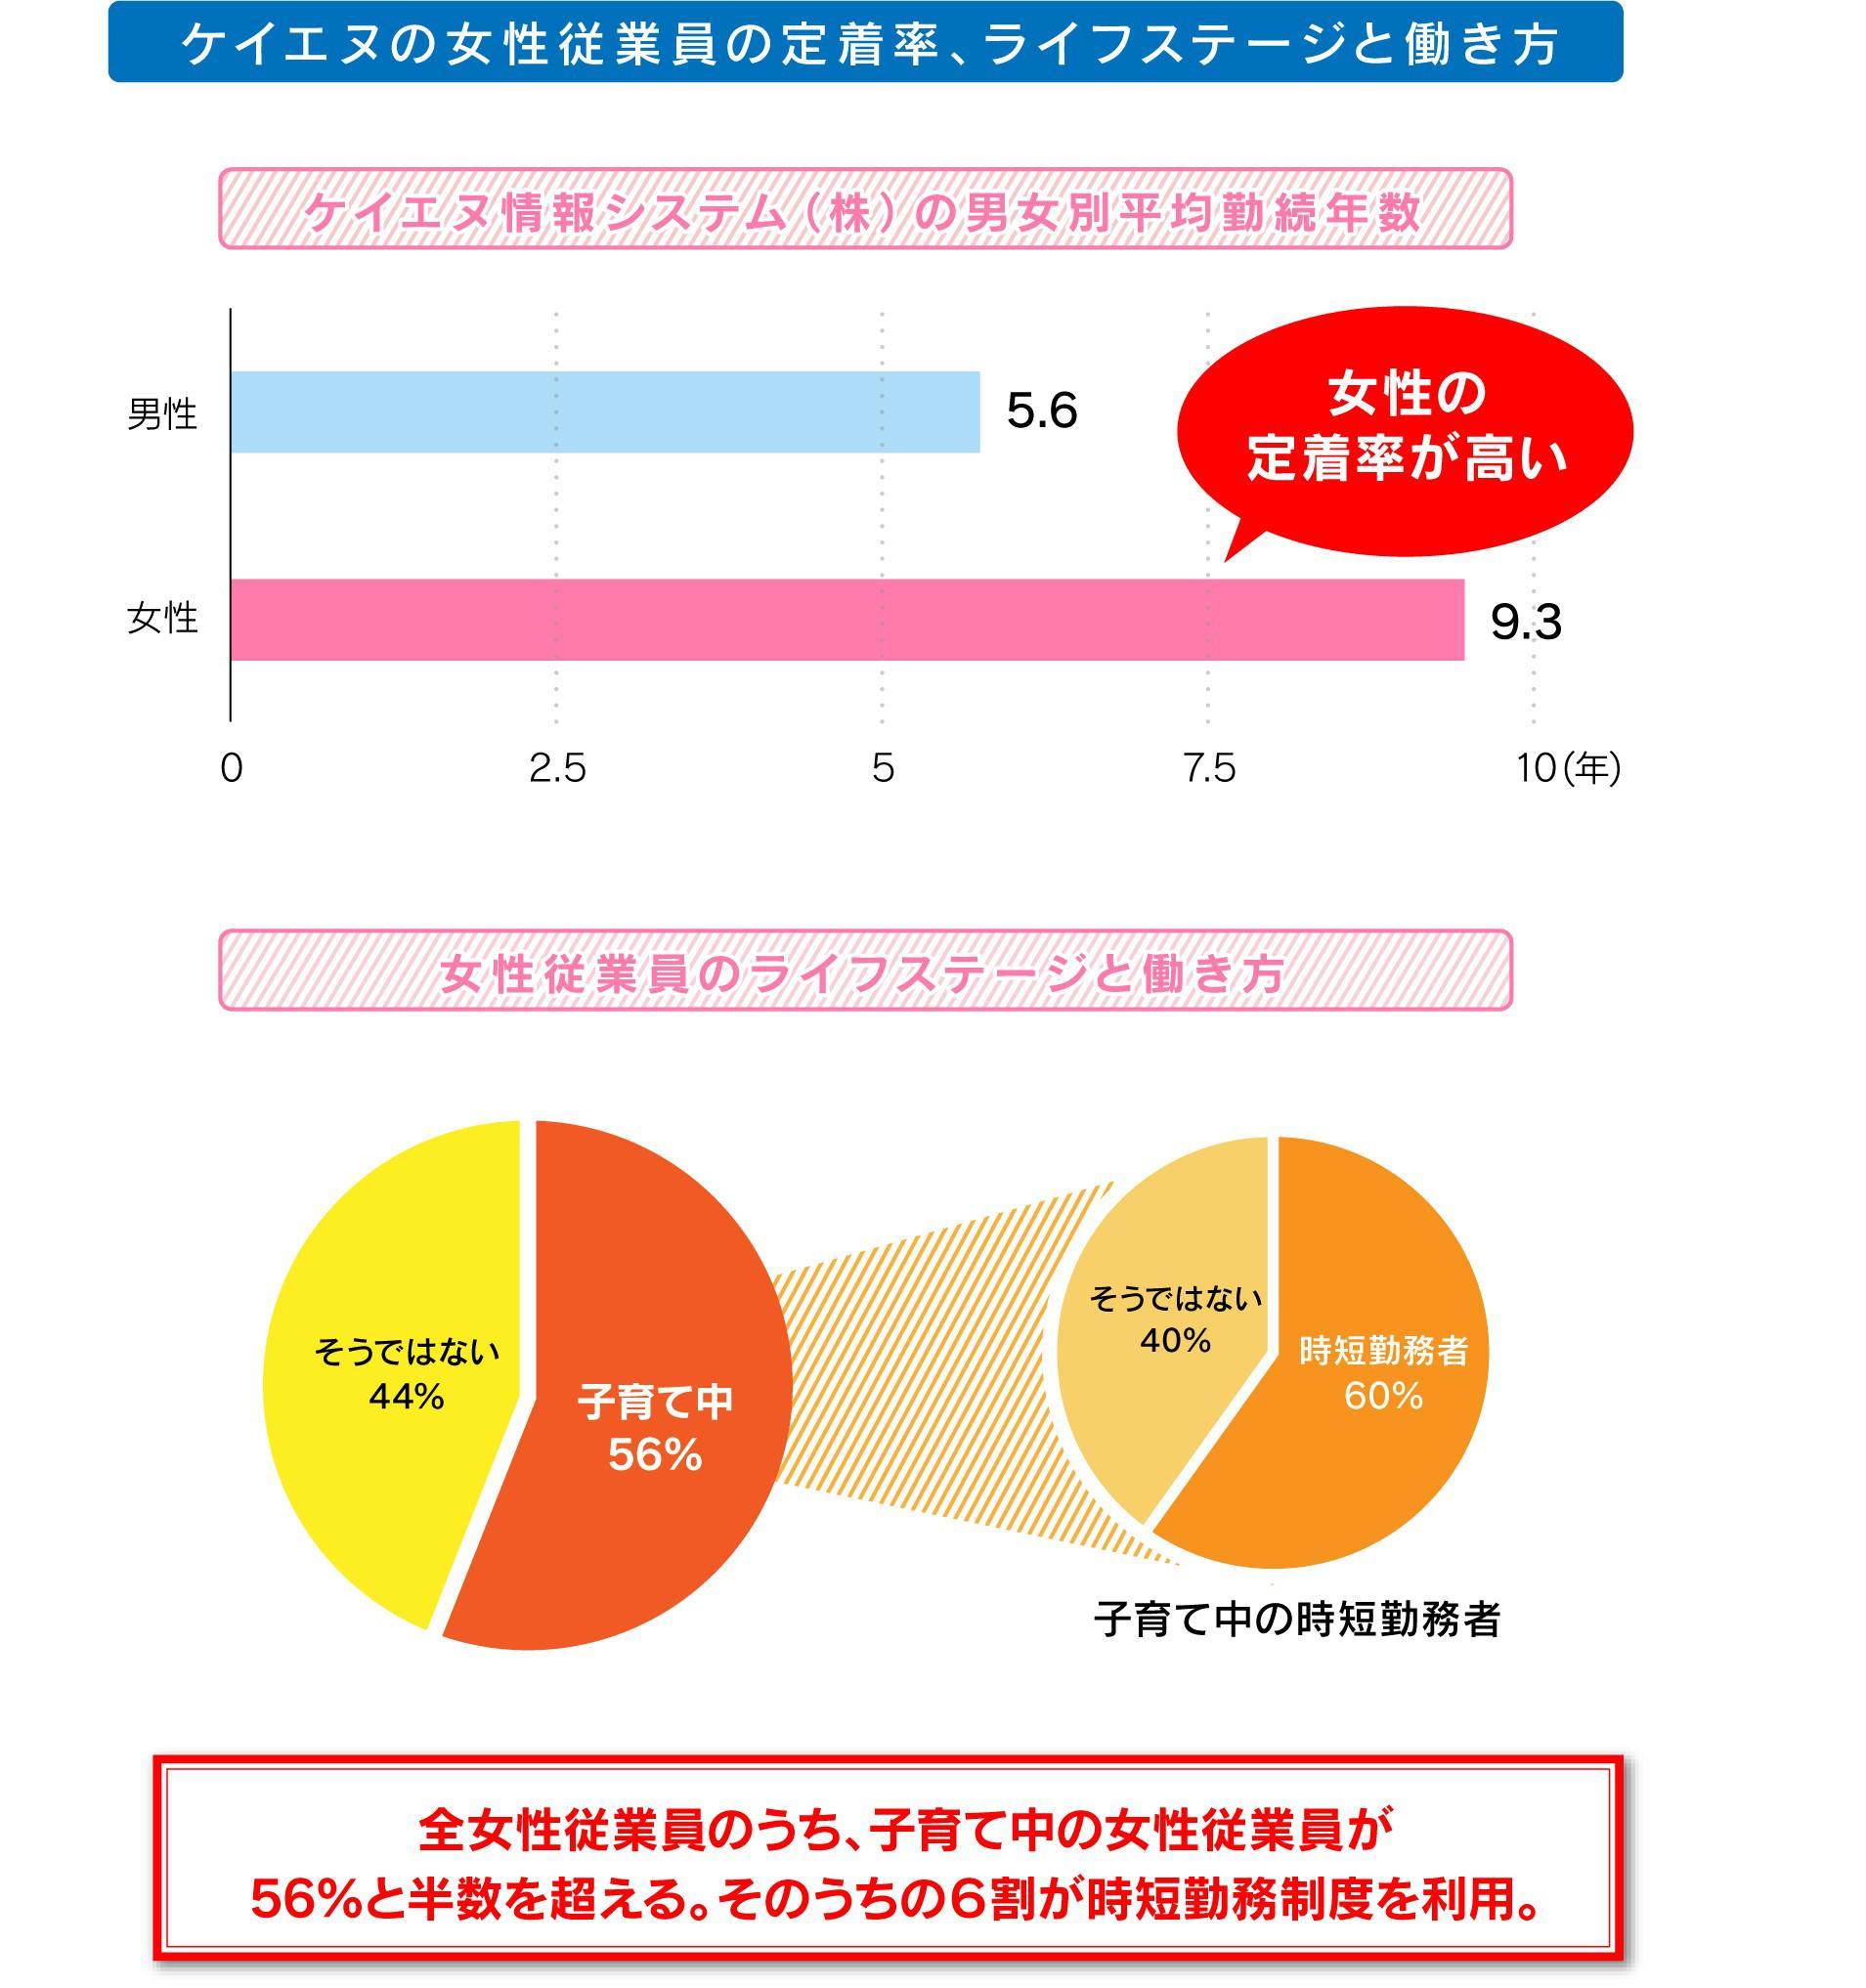 http://hint-hiroshima.com/keiei/upload/type2_knc_5.jpg